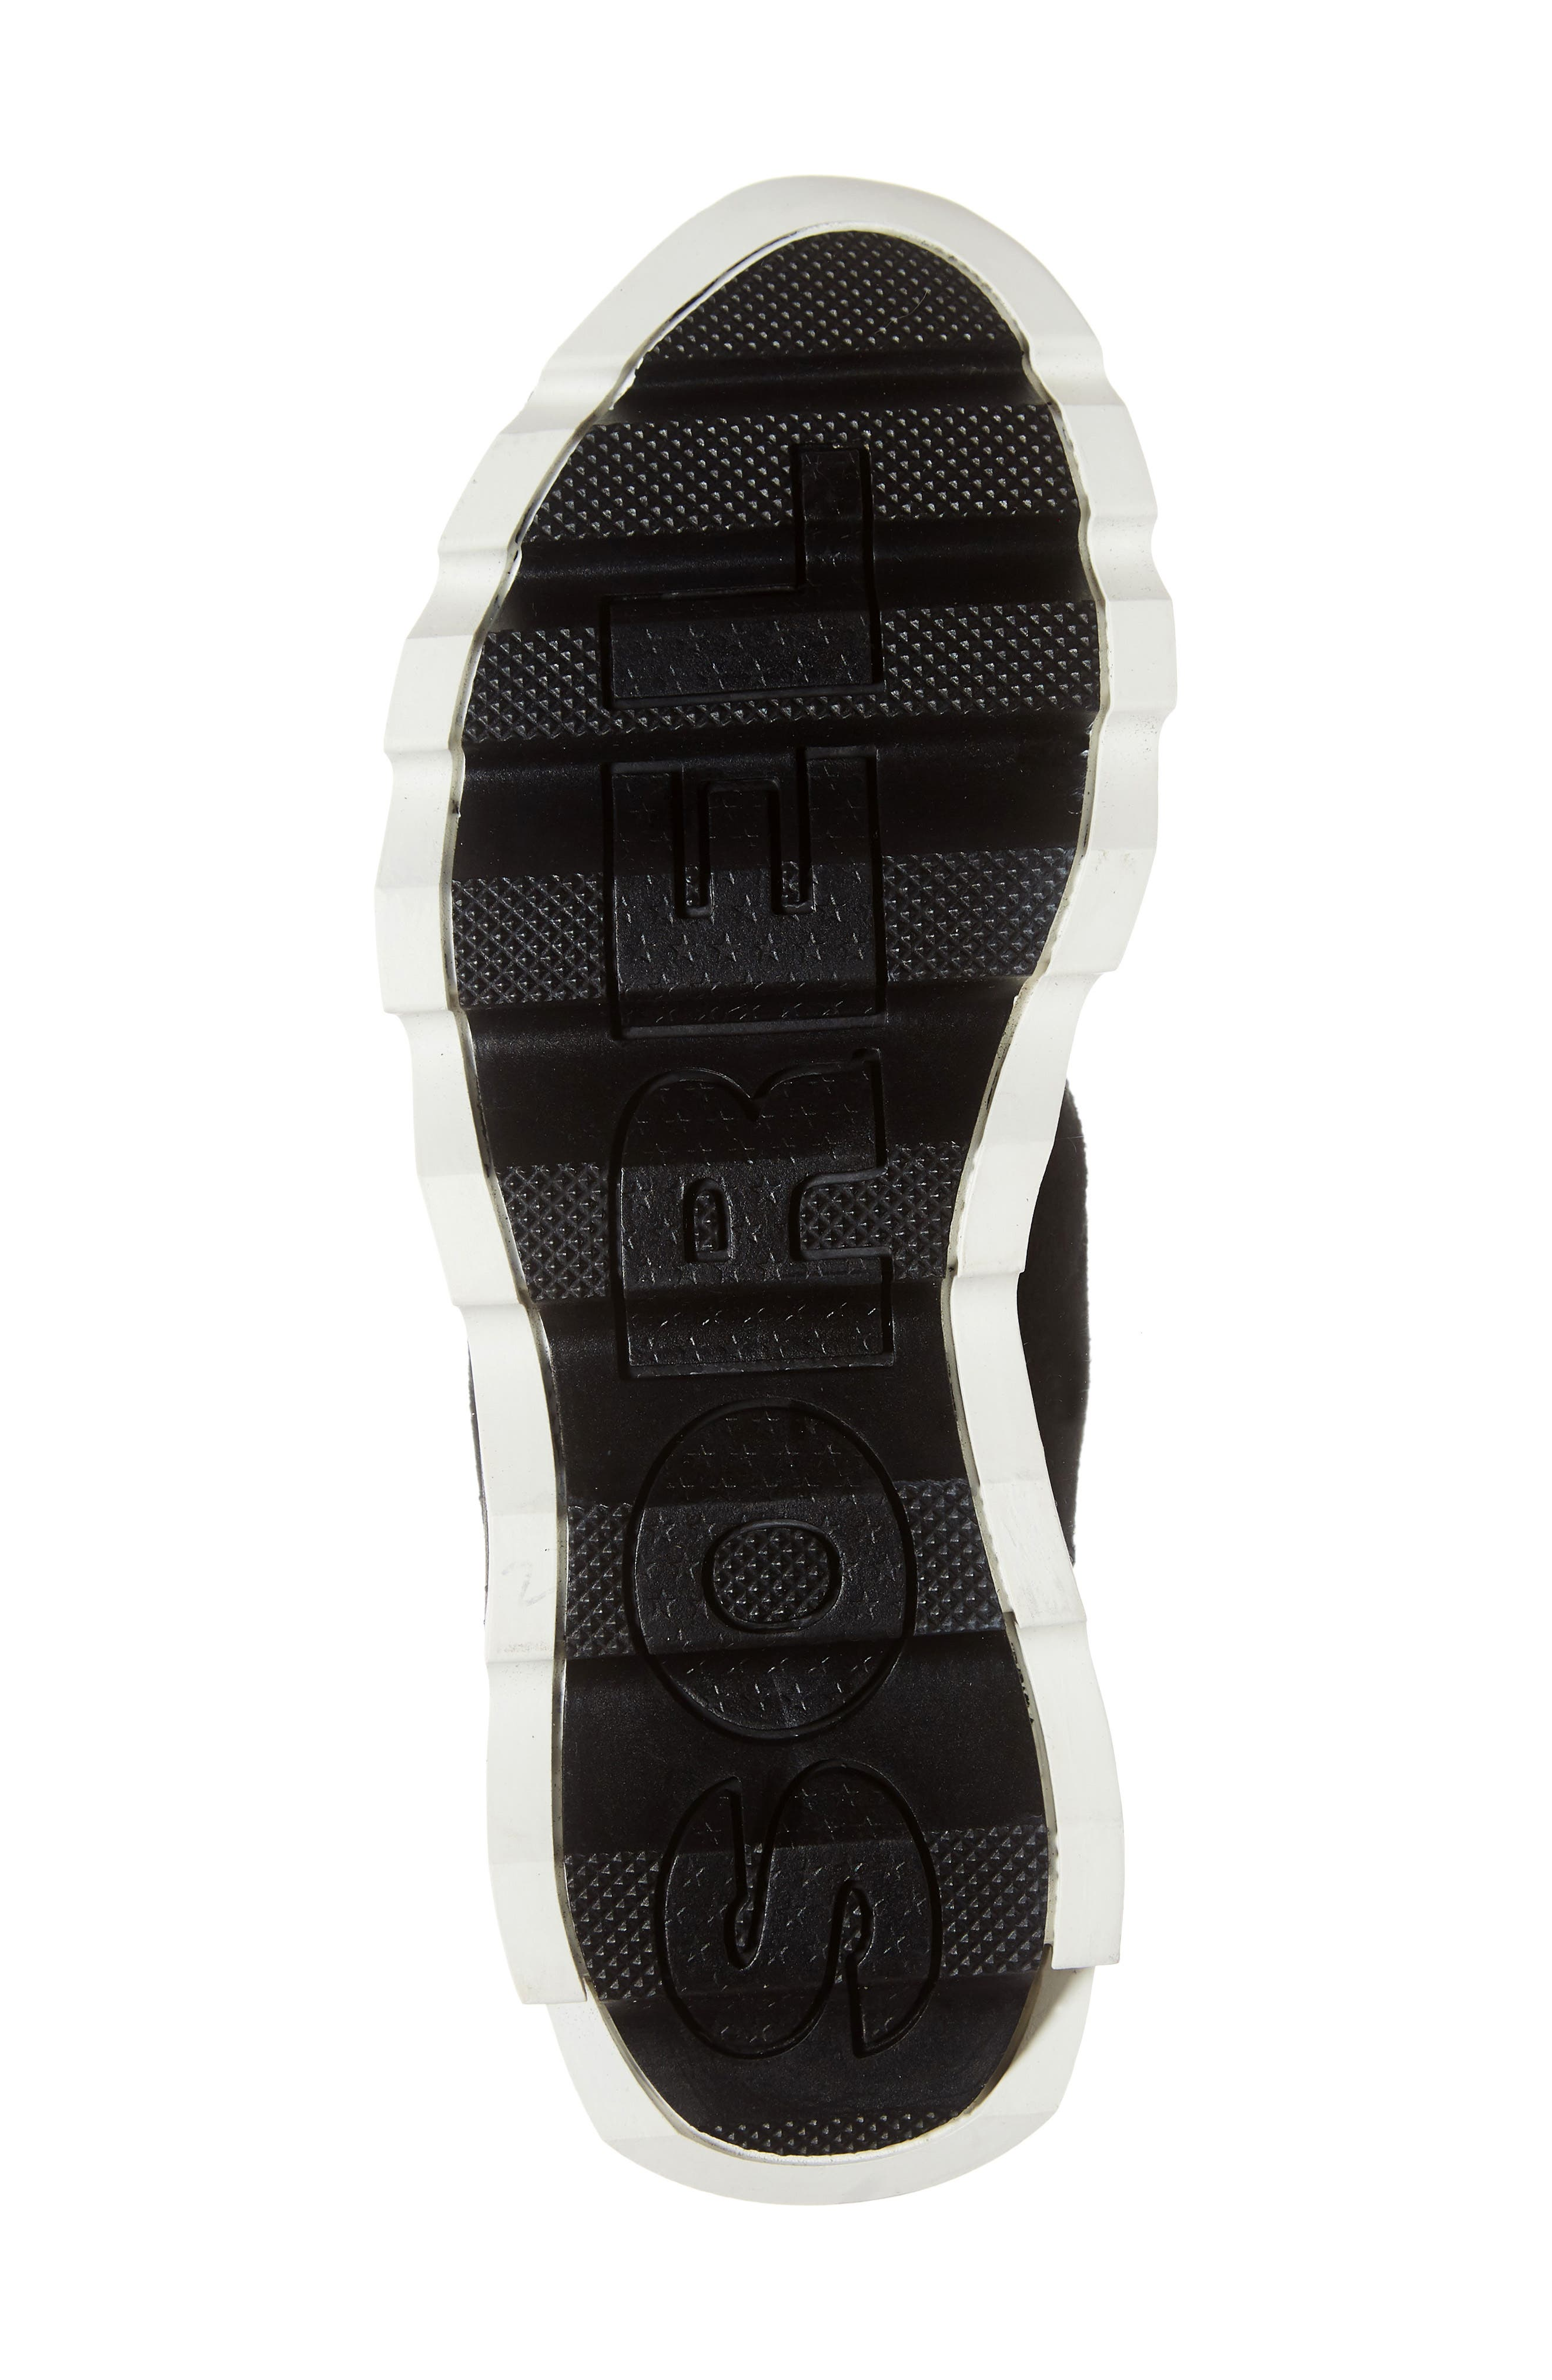 Kinetic Insulated Waterproof Short Boots,                             Alternate thumbnail 6, color,                             BLACK/ SEA SALT